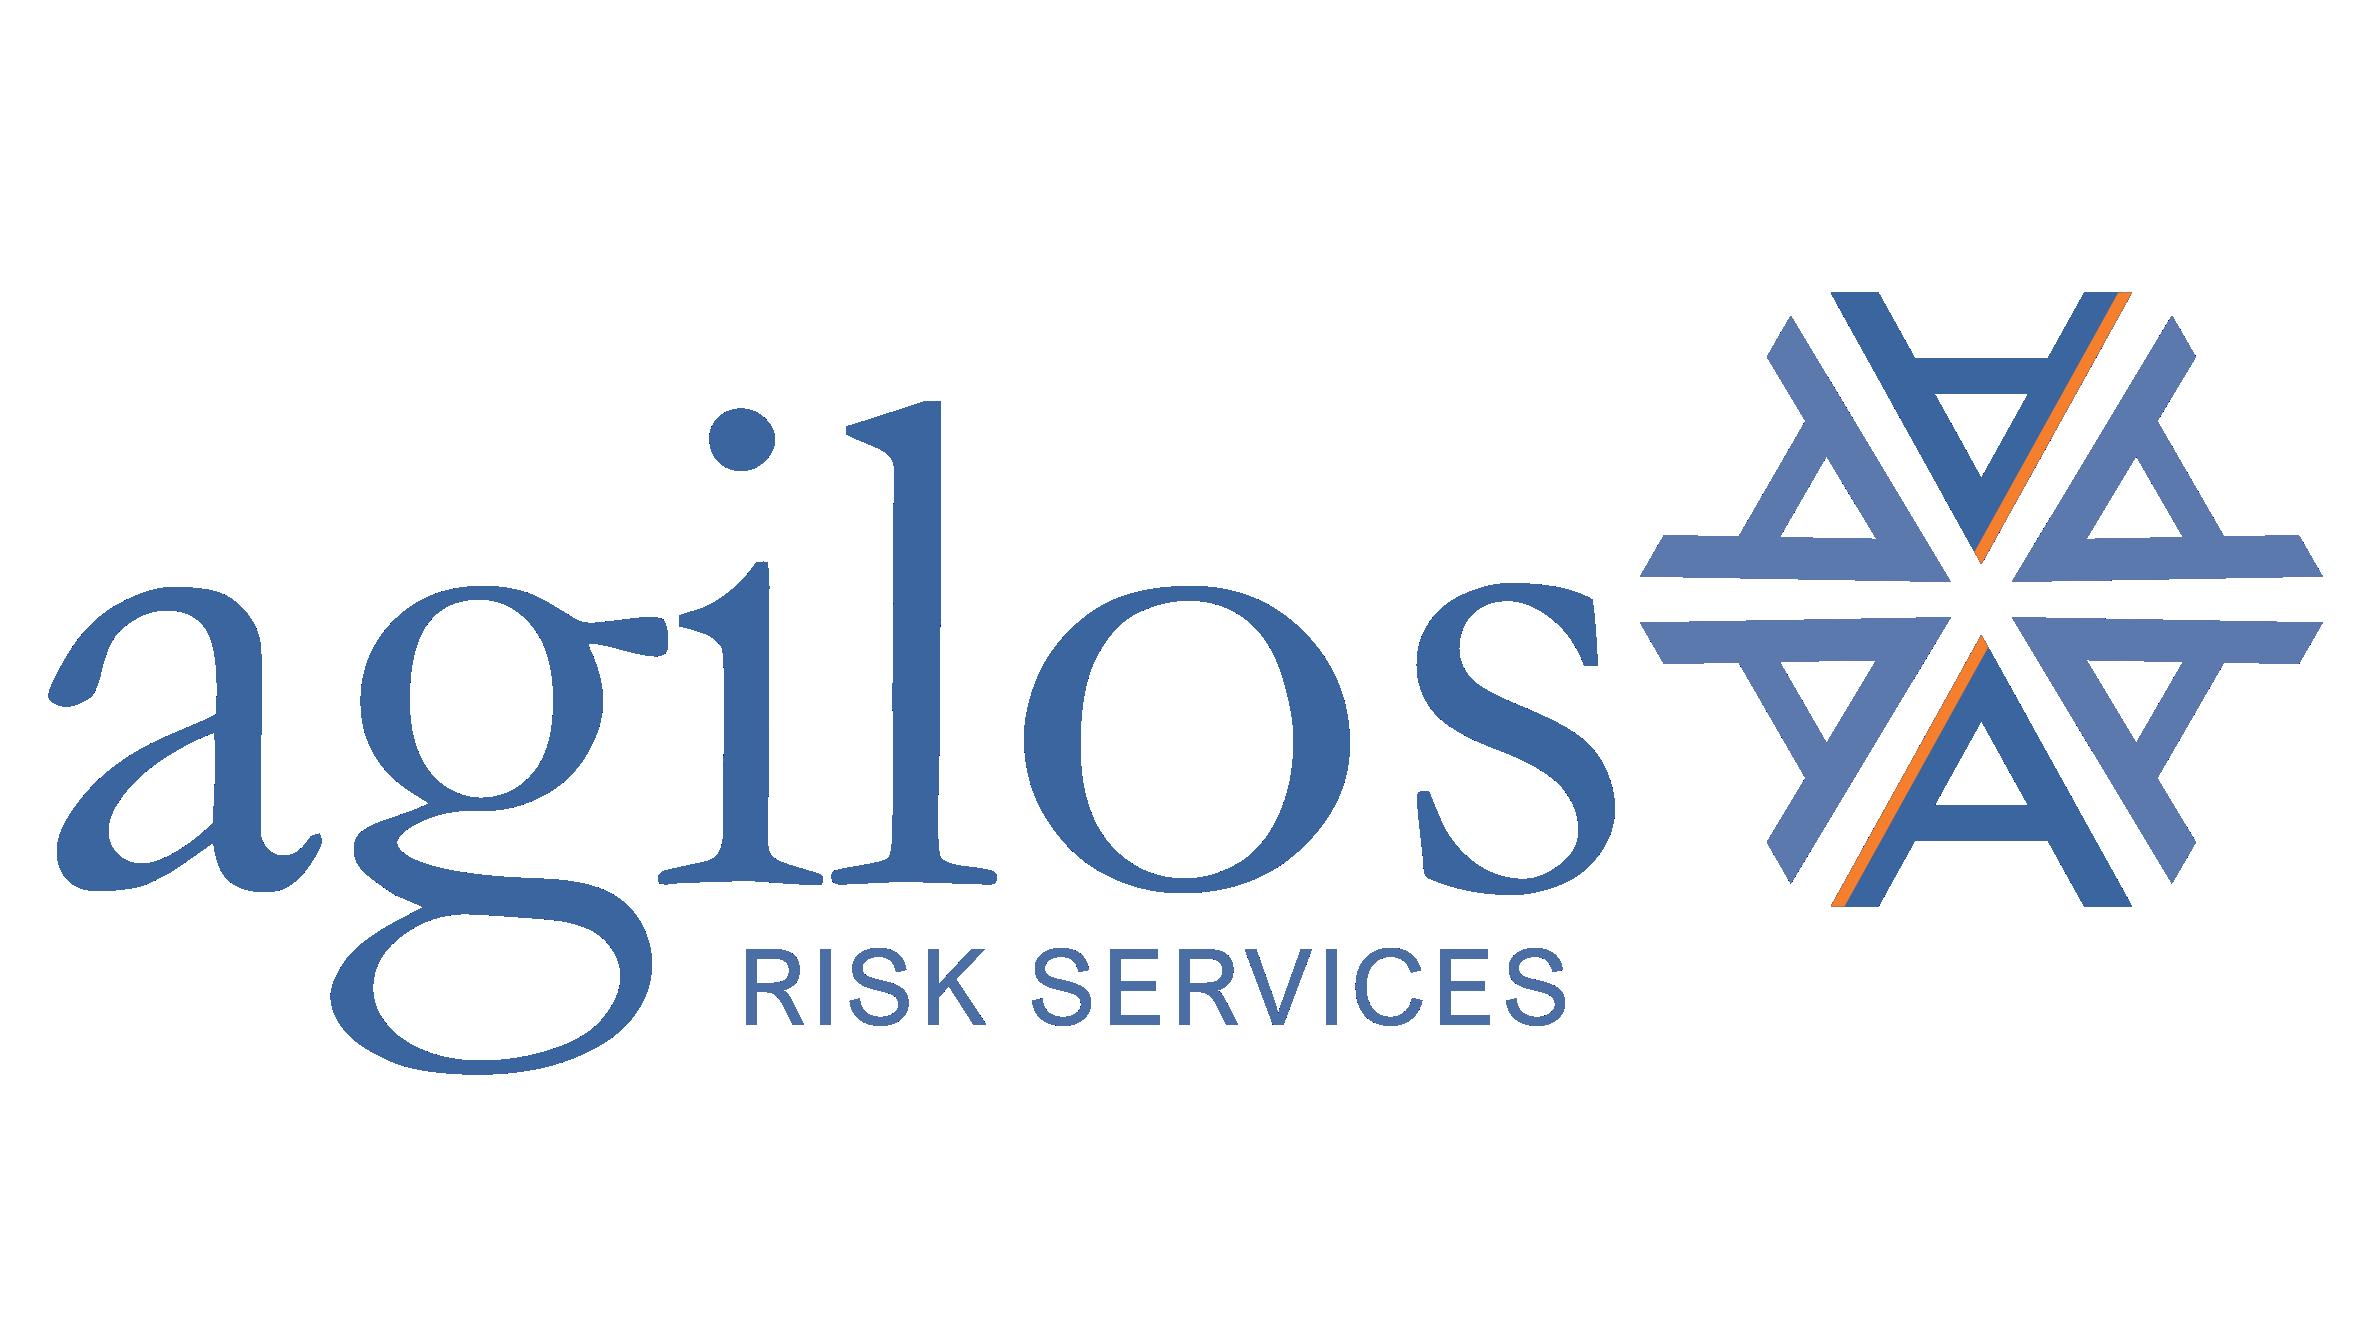 Logo of company agilos